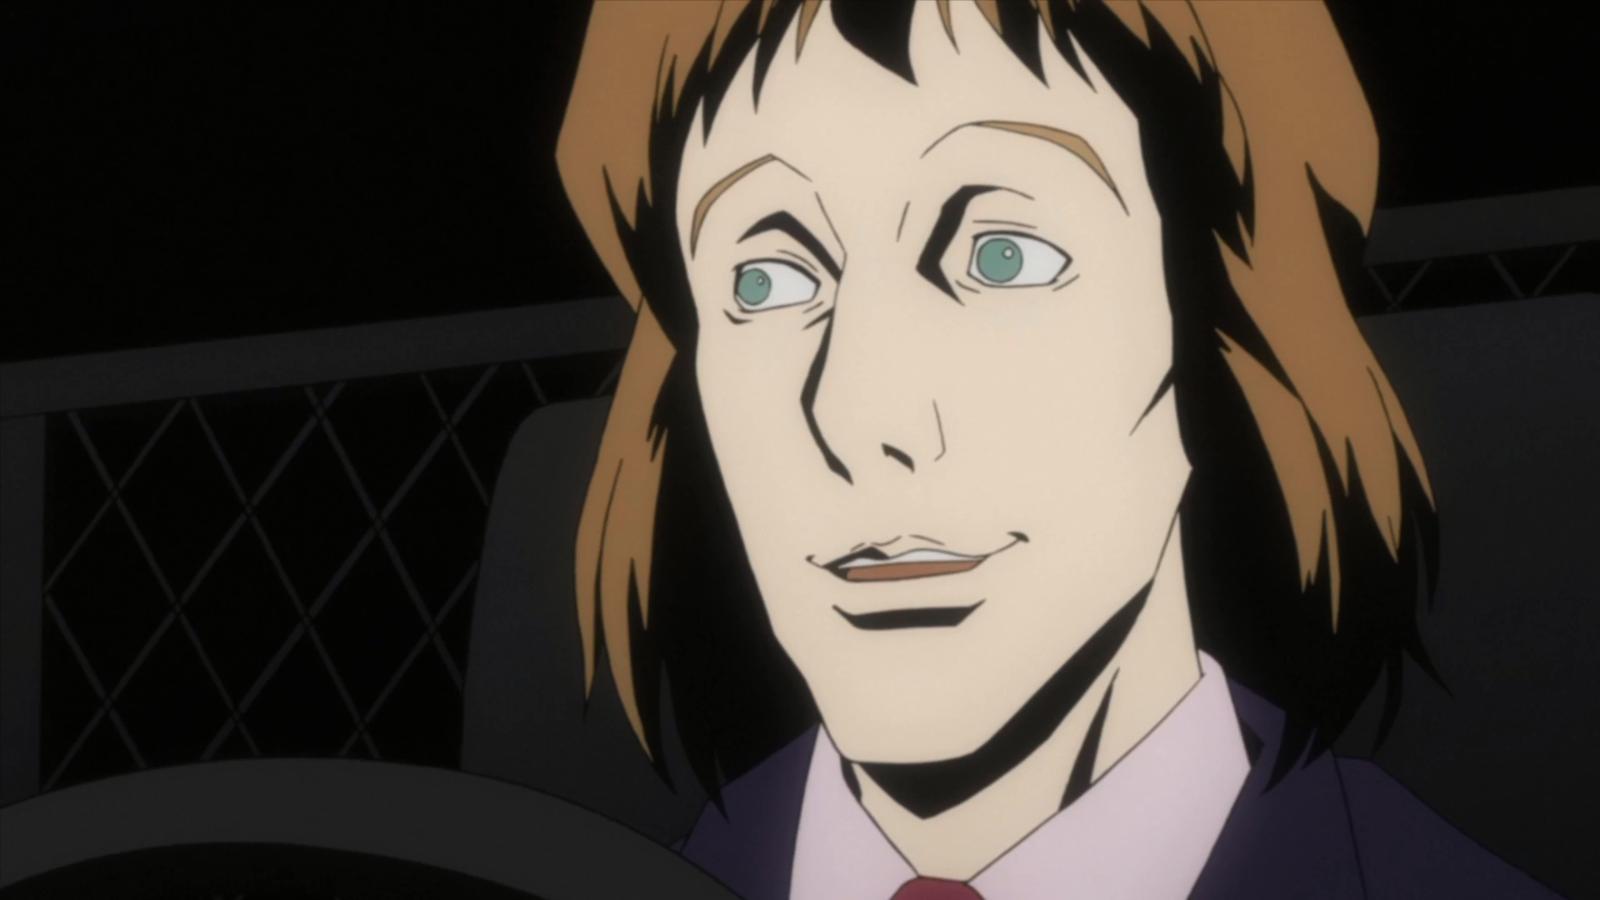 Michael (Anime Series)